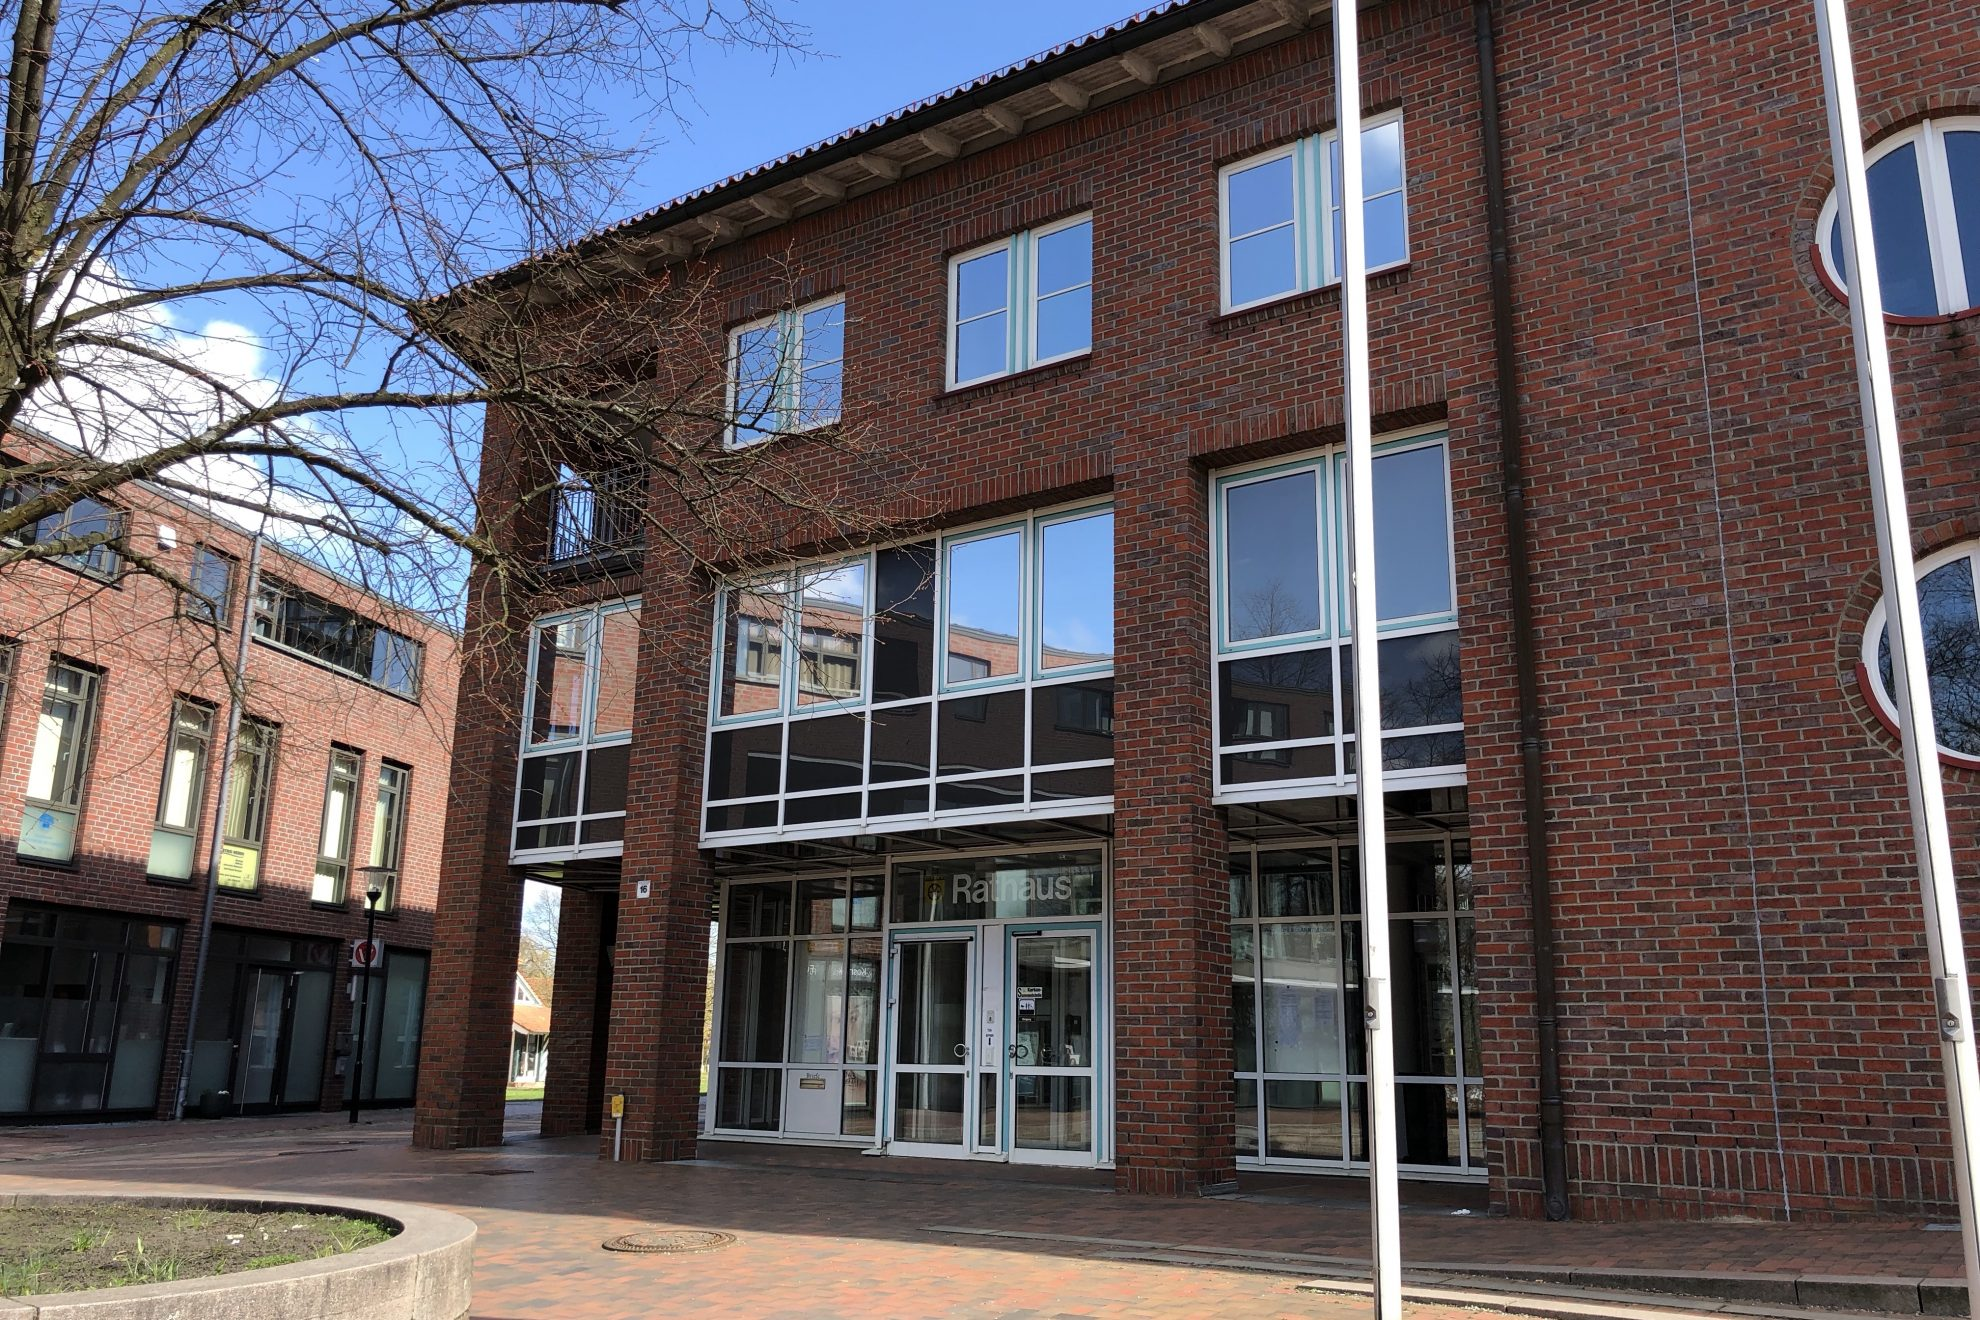 Wentorfer Rathaus